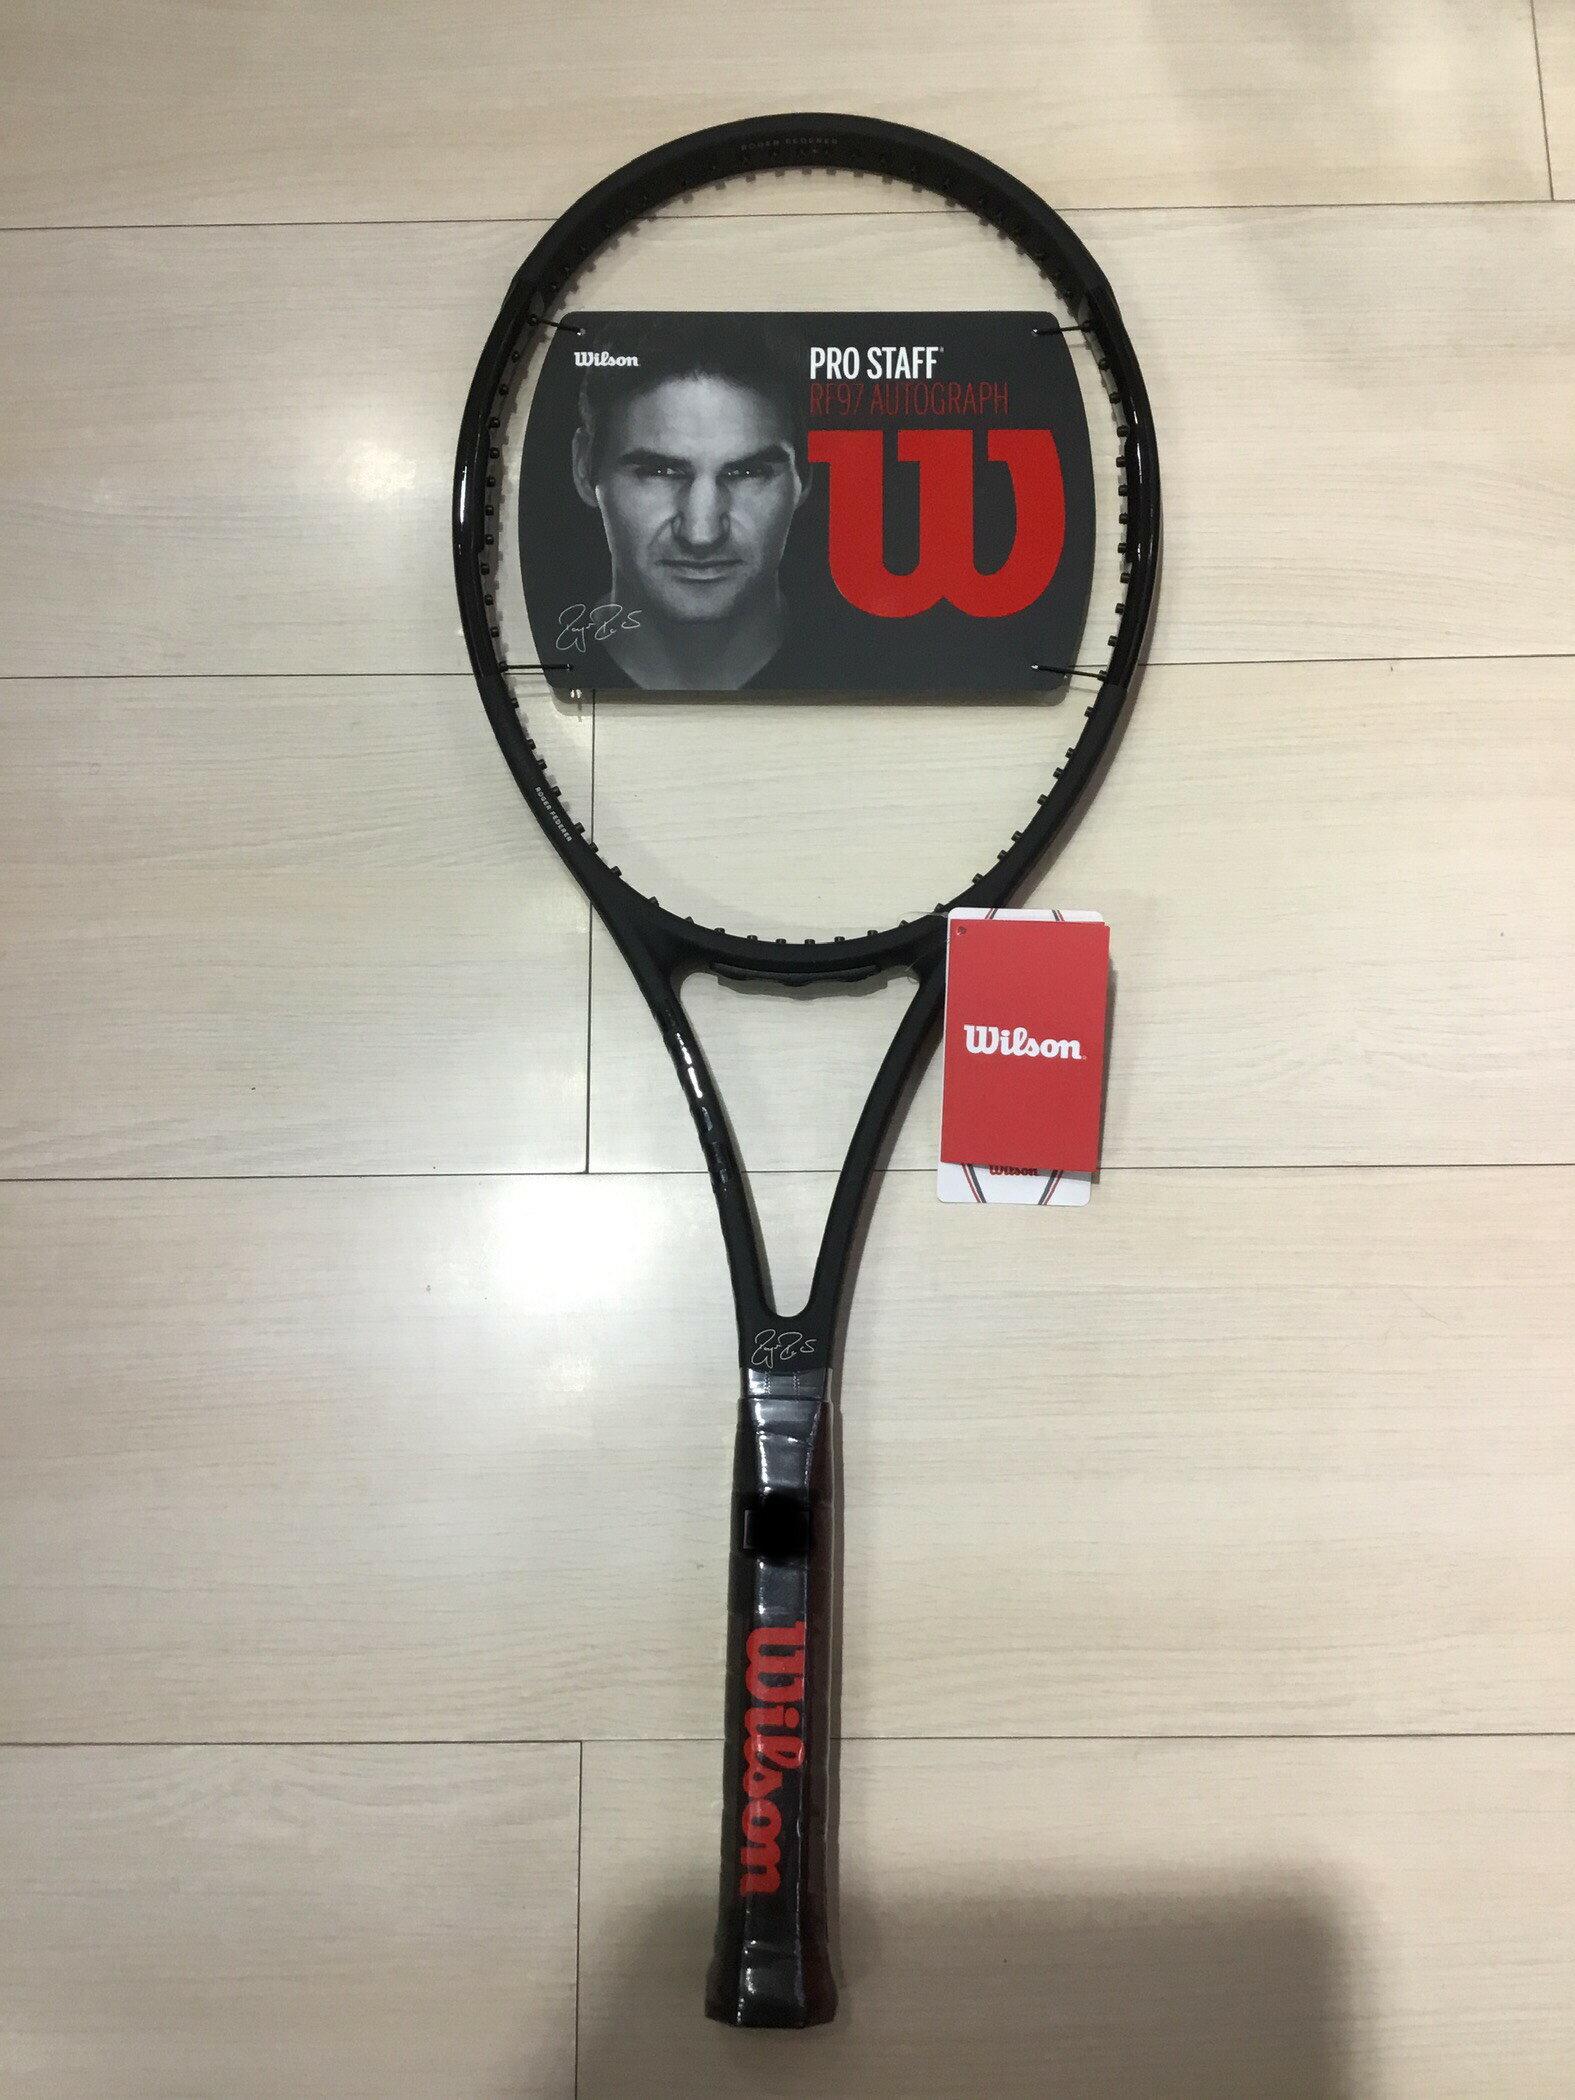 Wilson Pro Staff RF97 費德勒簽名版 專業網球拍